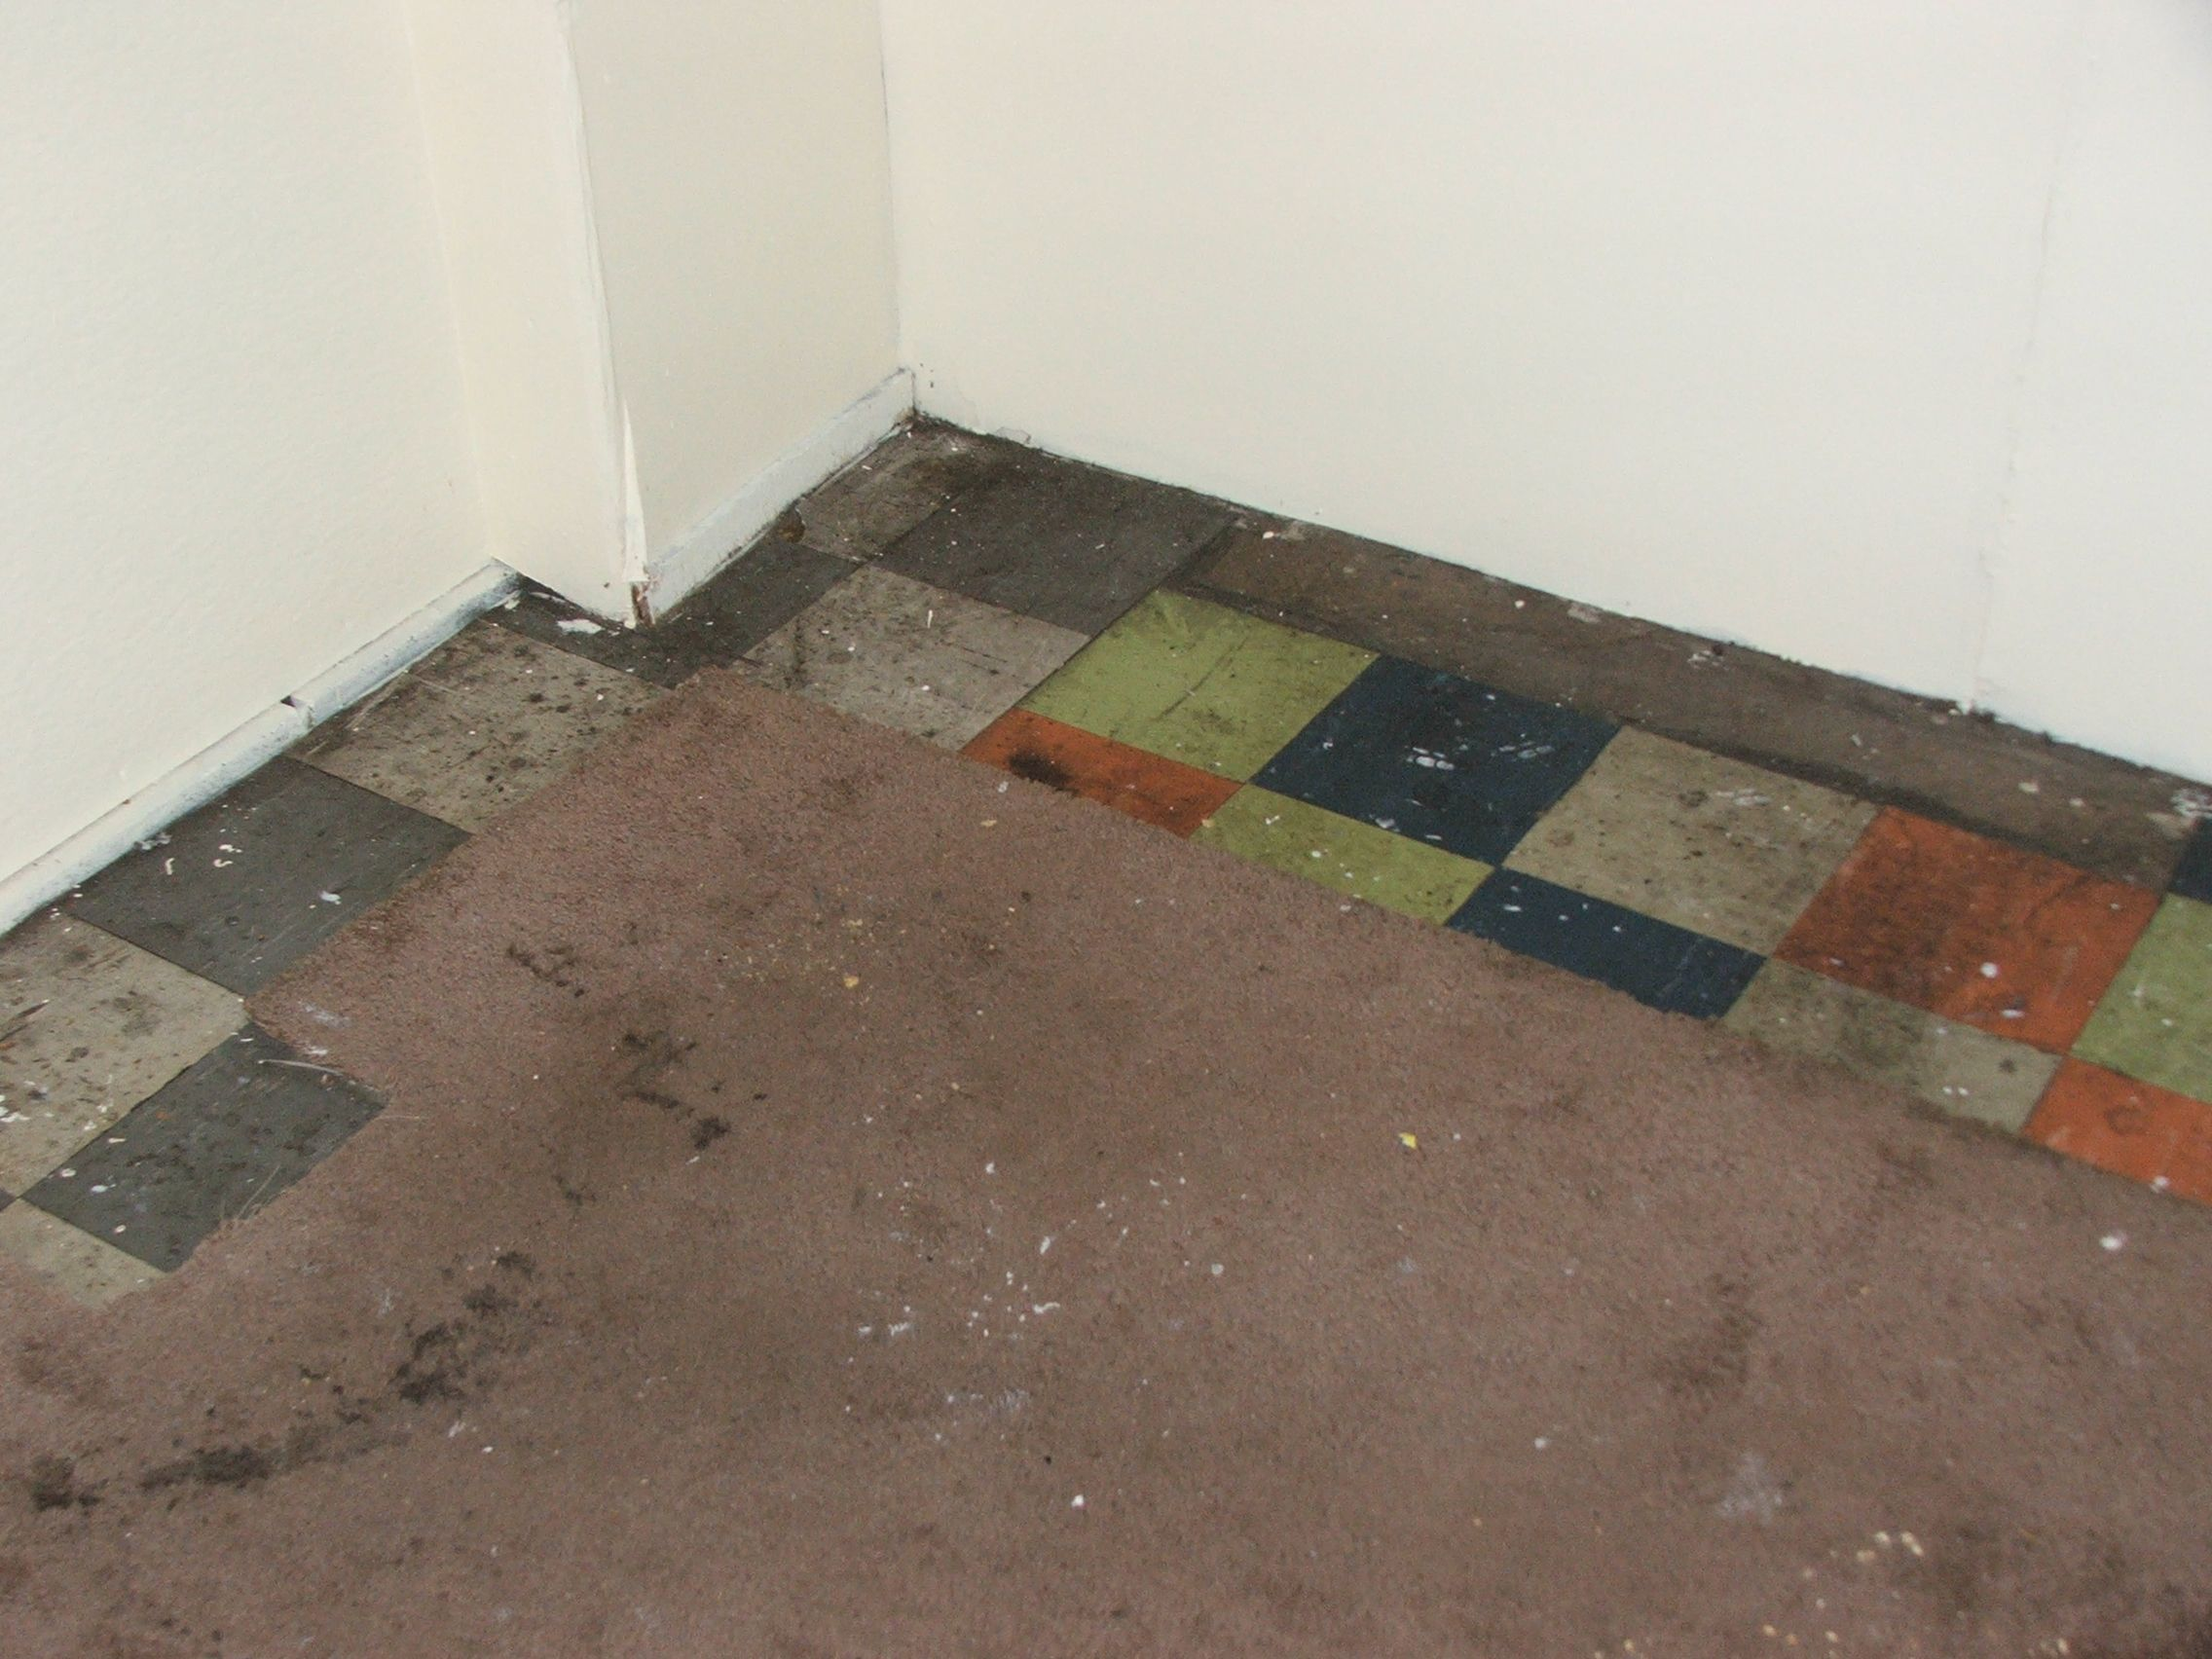 Asbestos content in old vinyl floor tiles (Chrysotile